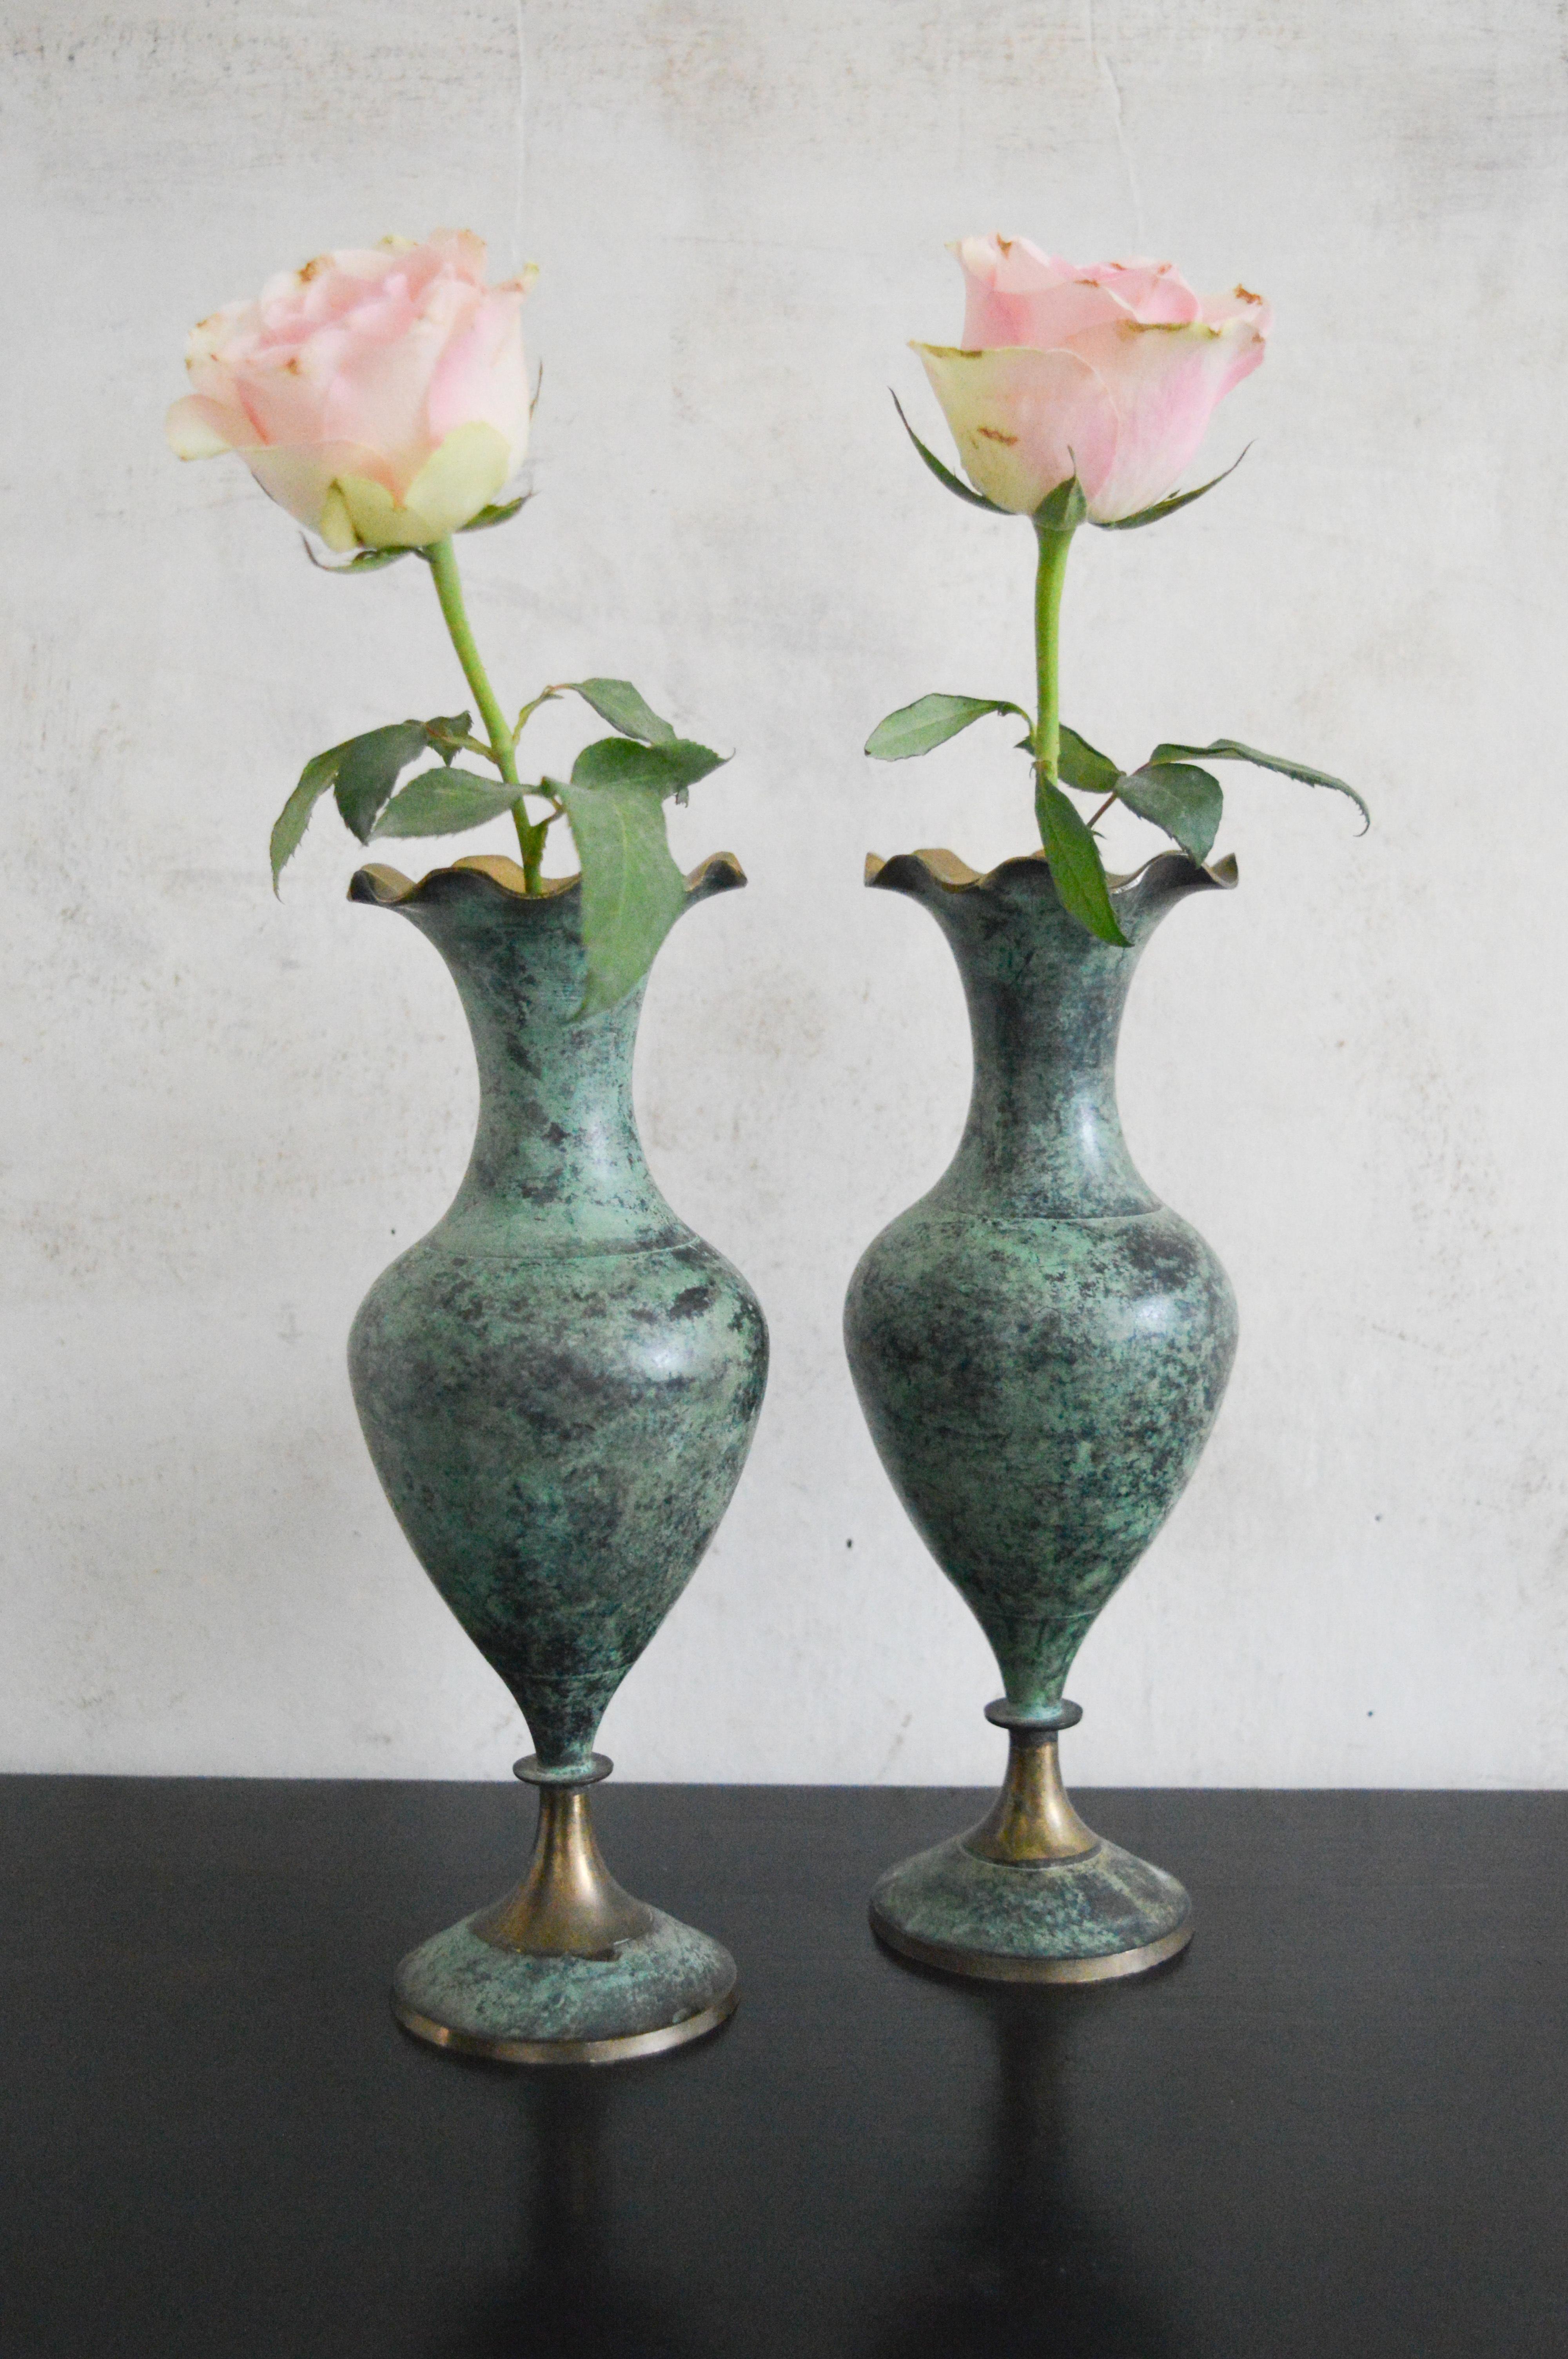 Vinterior & Pair Brass Vases Emerald Green With Fluted Edge Handmade Large Vintage Bud Decorative Flower Vases Brass Table Centrepiece Vases